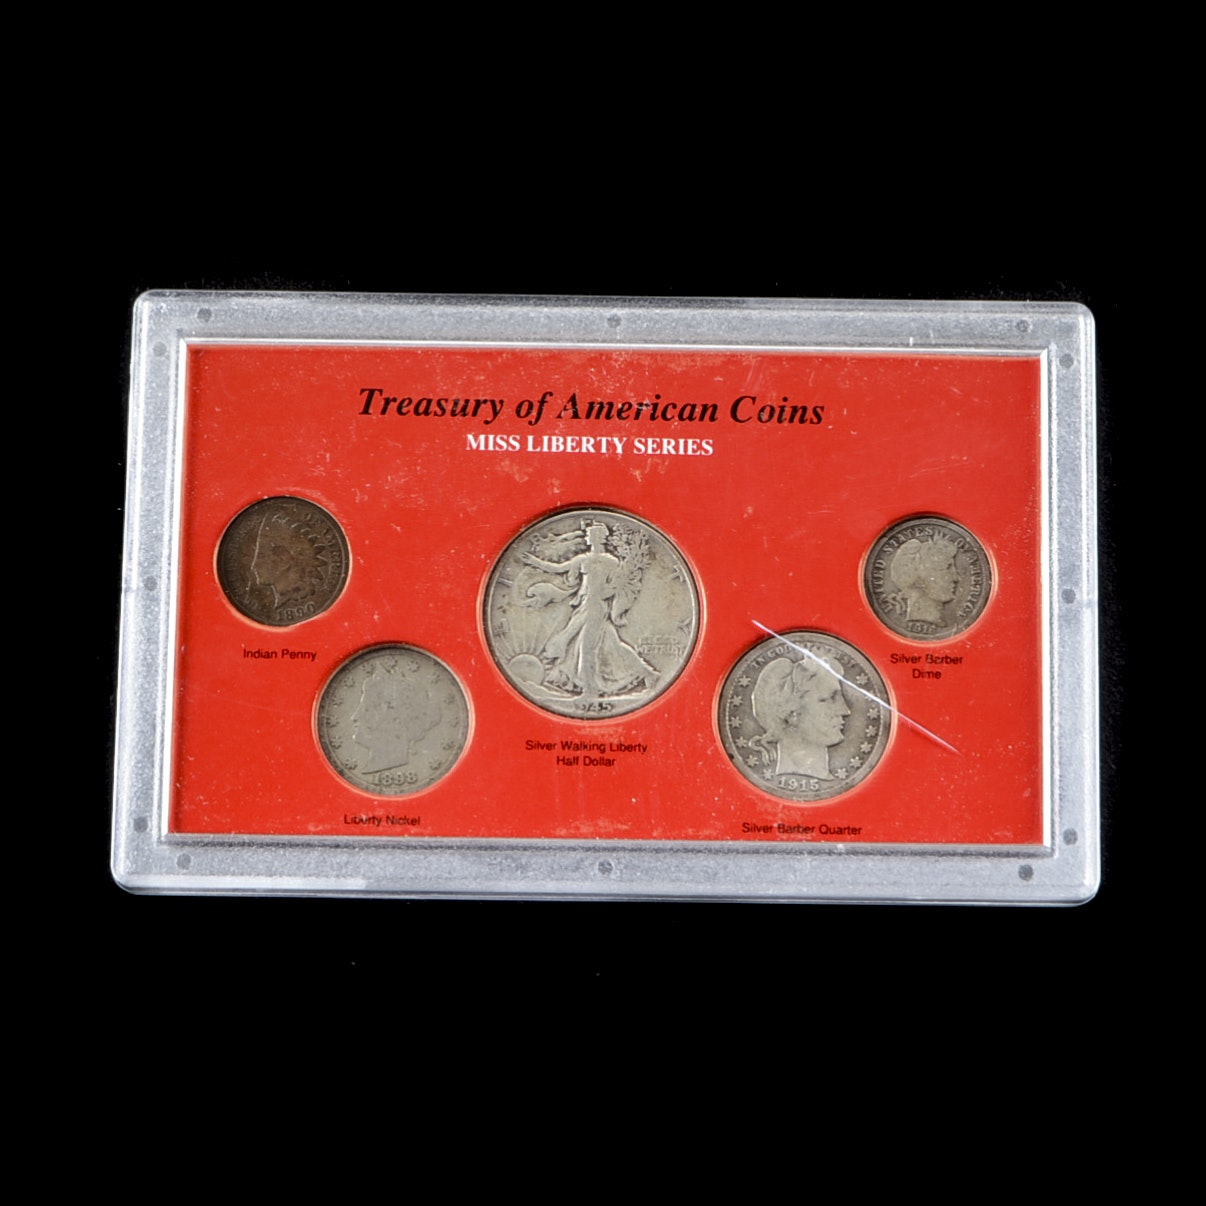 Miss Liberty Series Coin Set